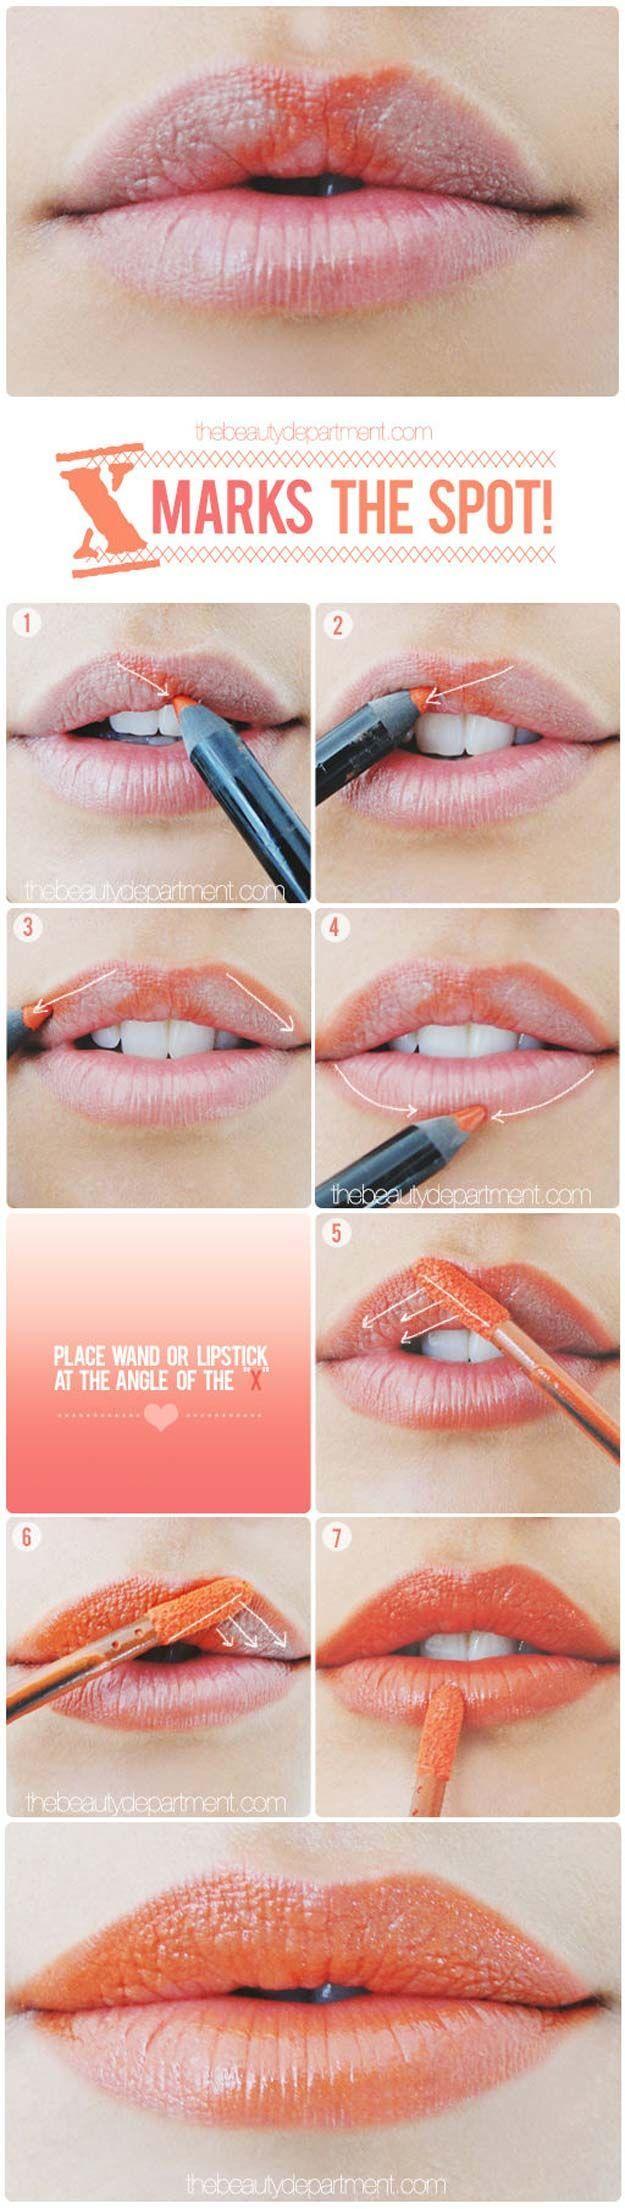 best 25+ best lipstick brand ideas on pinterest | lipstick brands